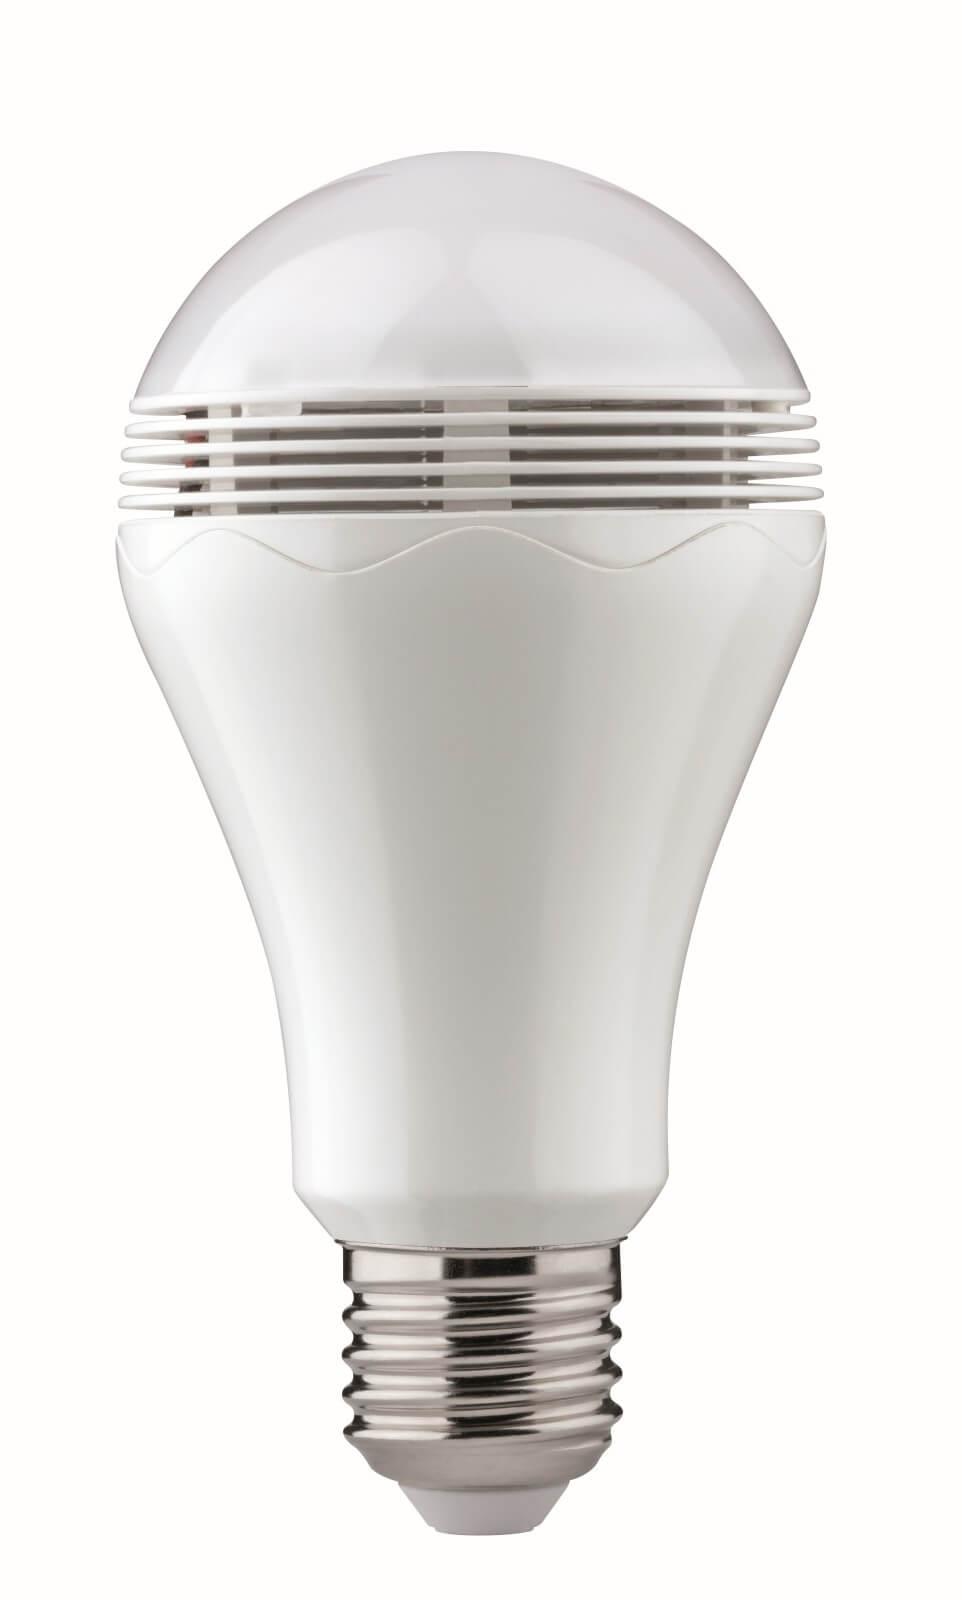 Paulmann LED-Lampe mit integriertem Bluetooth-Lautsprecher | Smart ...